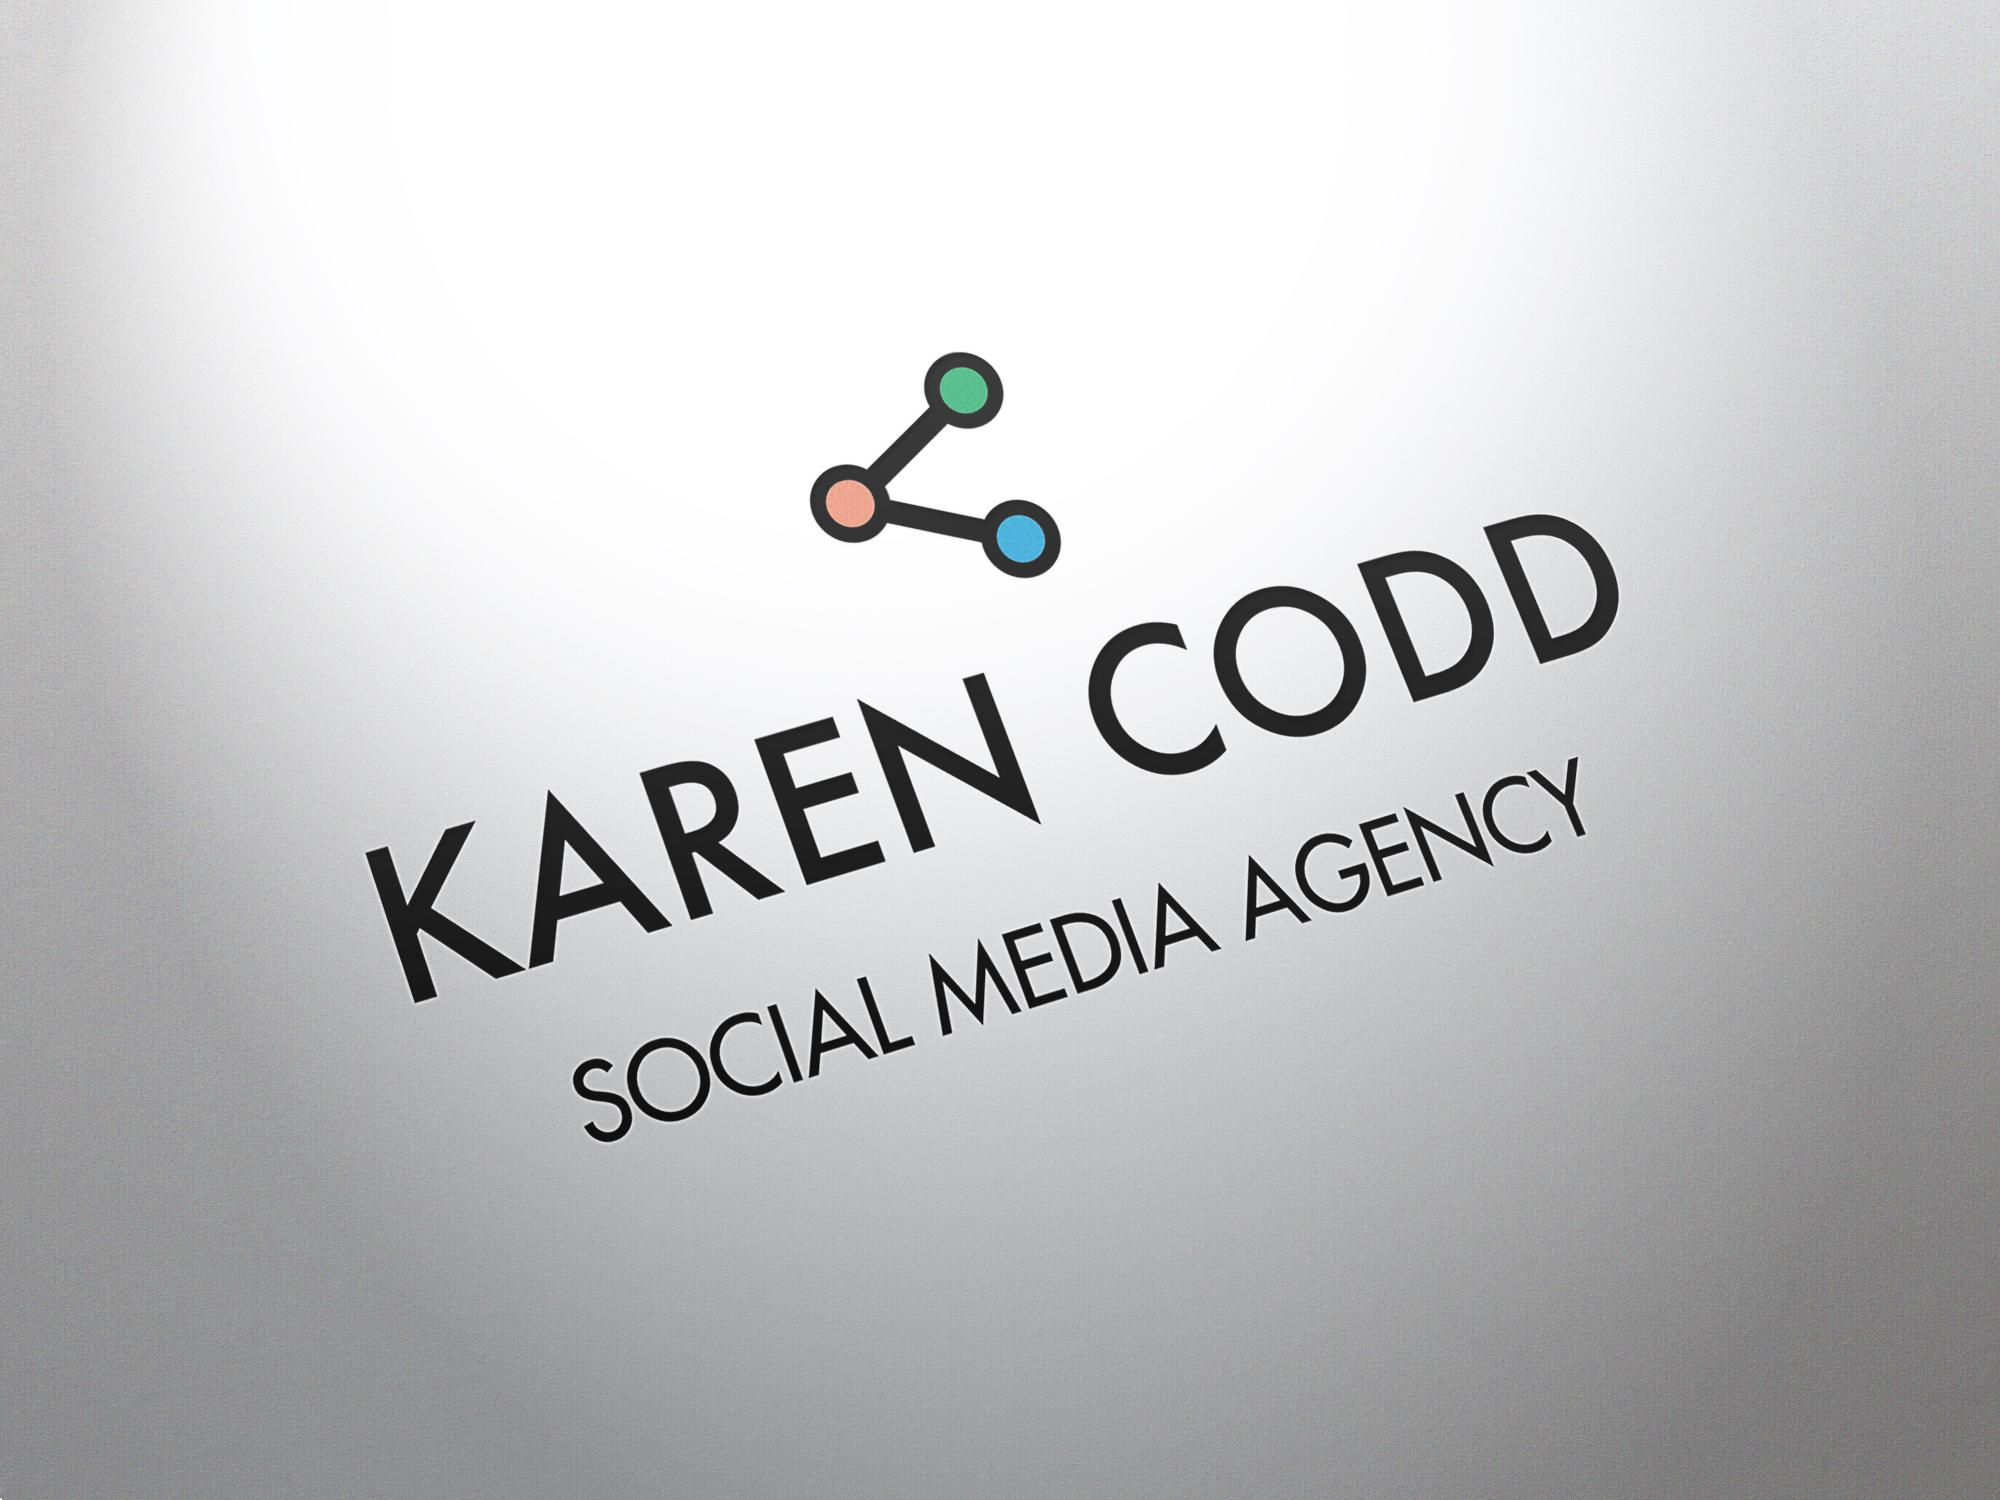 karen codd logo 06 - Our Work